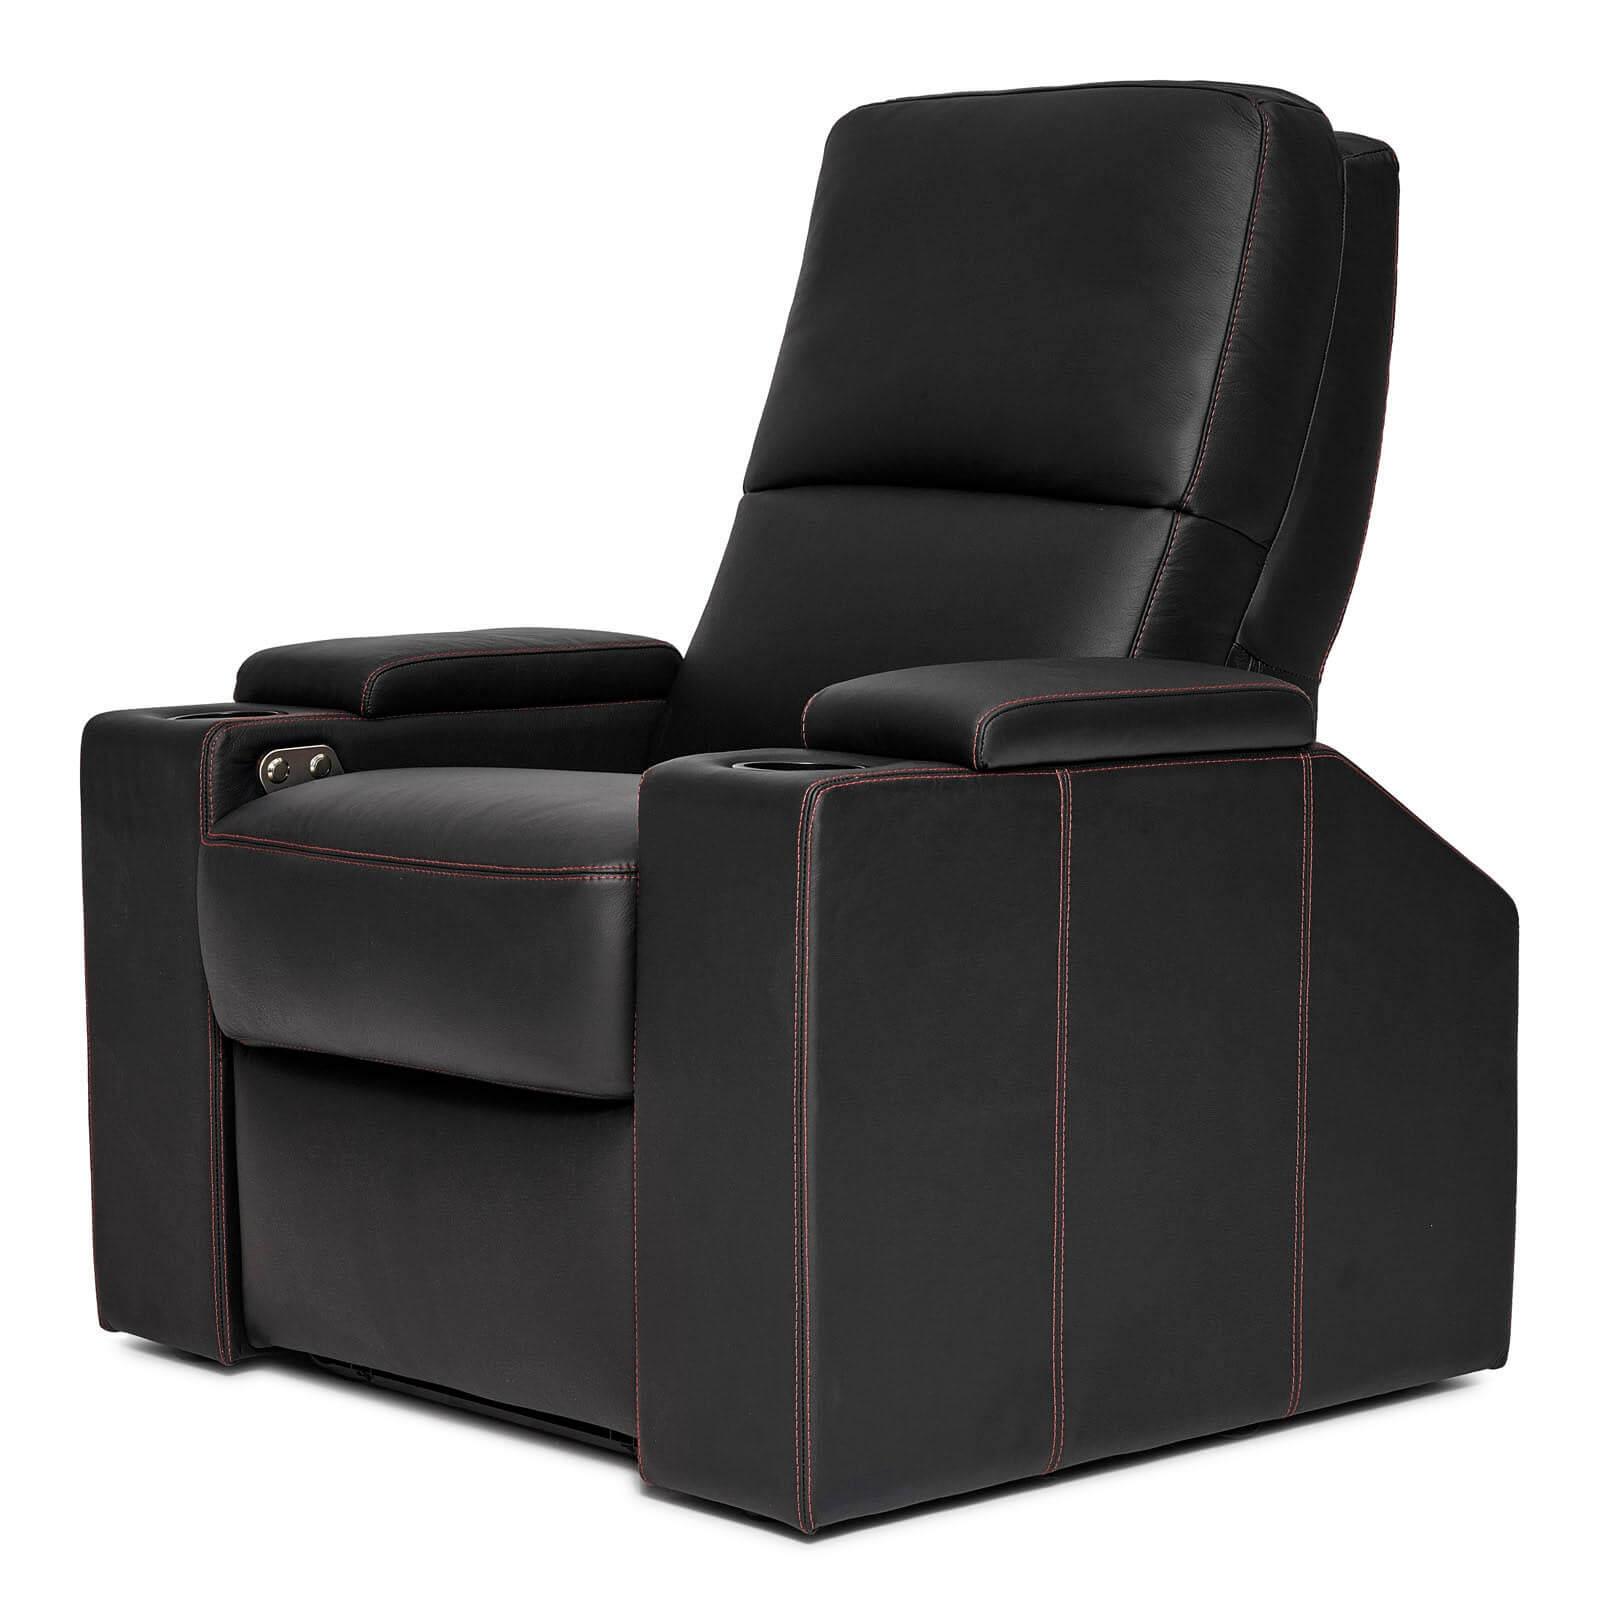 Moovia Black home cinema chair